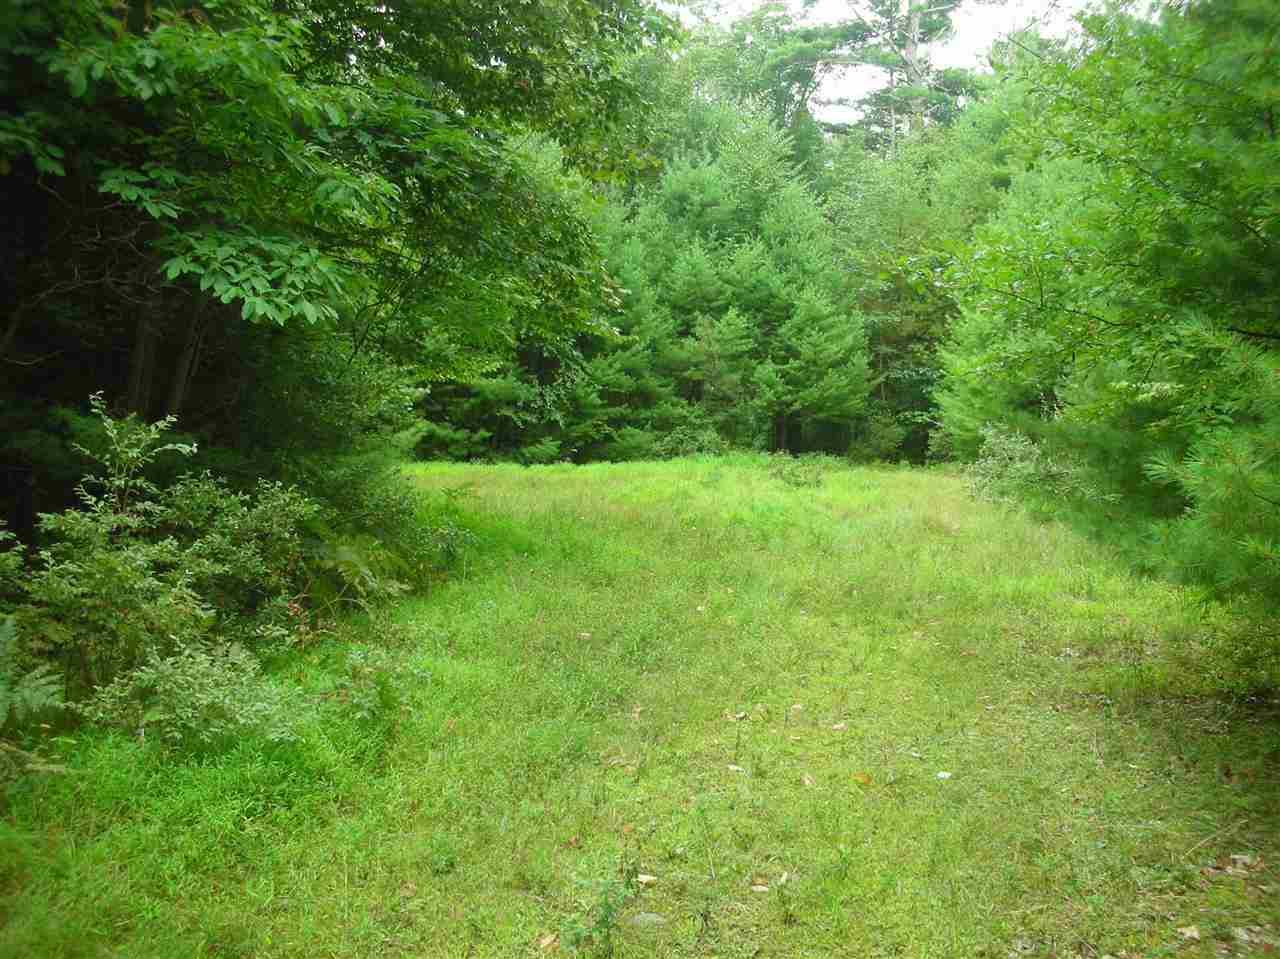 Real Estate for Sale, ListingId: 31769269, Wurtsboro,NY12790